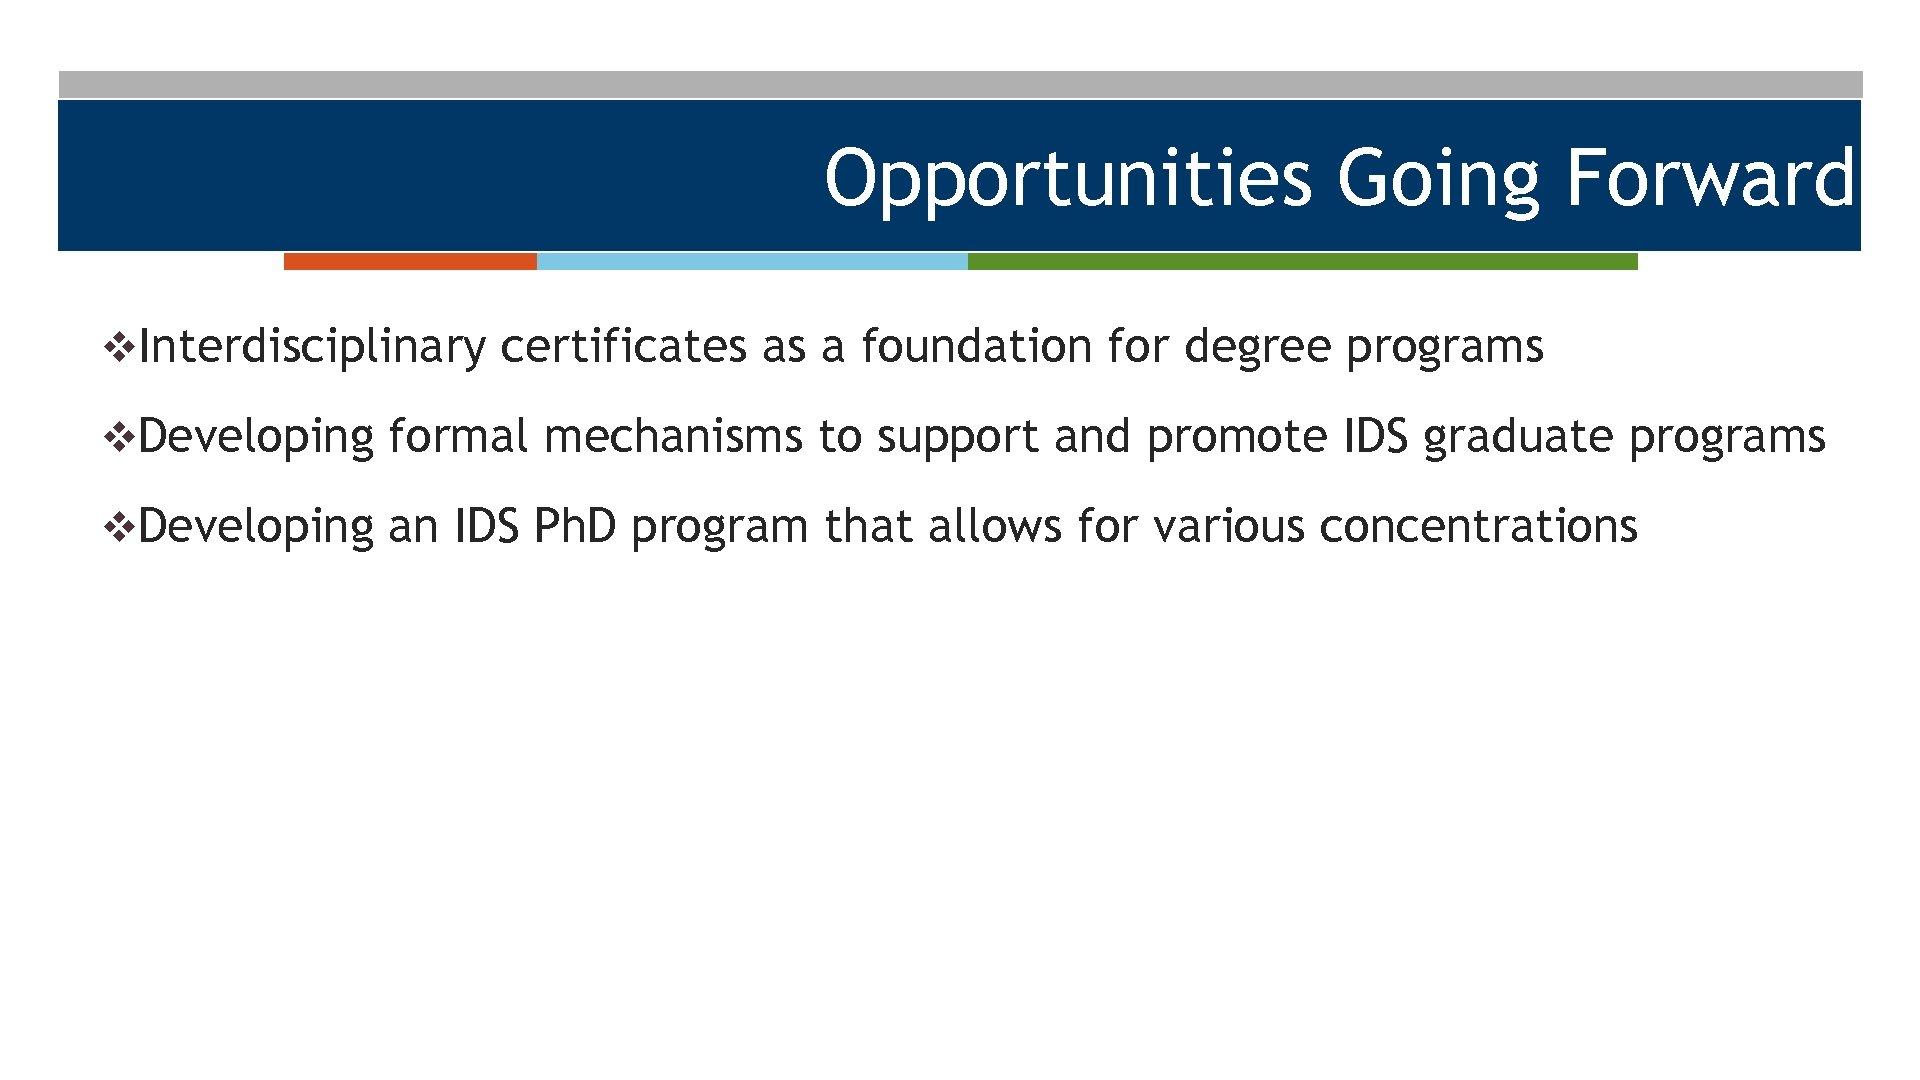 Opportunities Going Forward v. Interdisciplinary certificates as a foundation for degree programs v. Developing